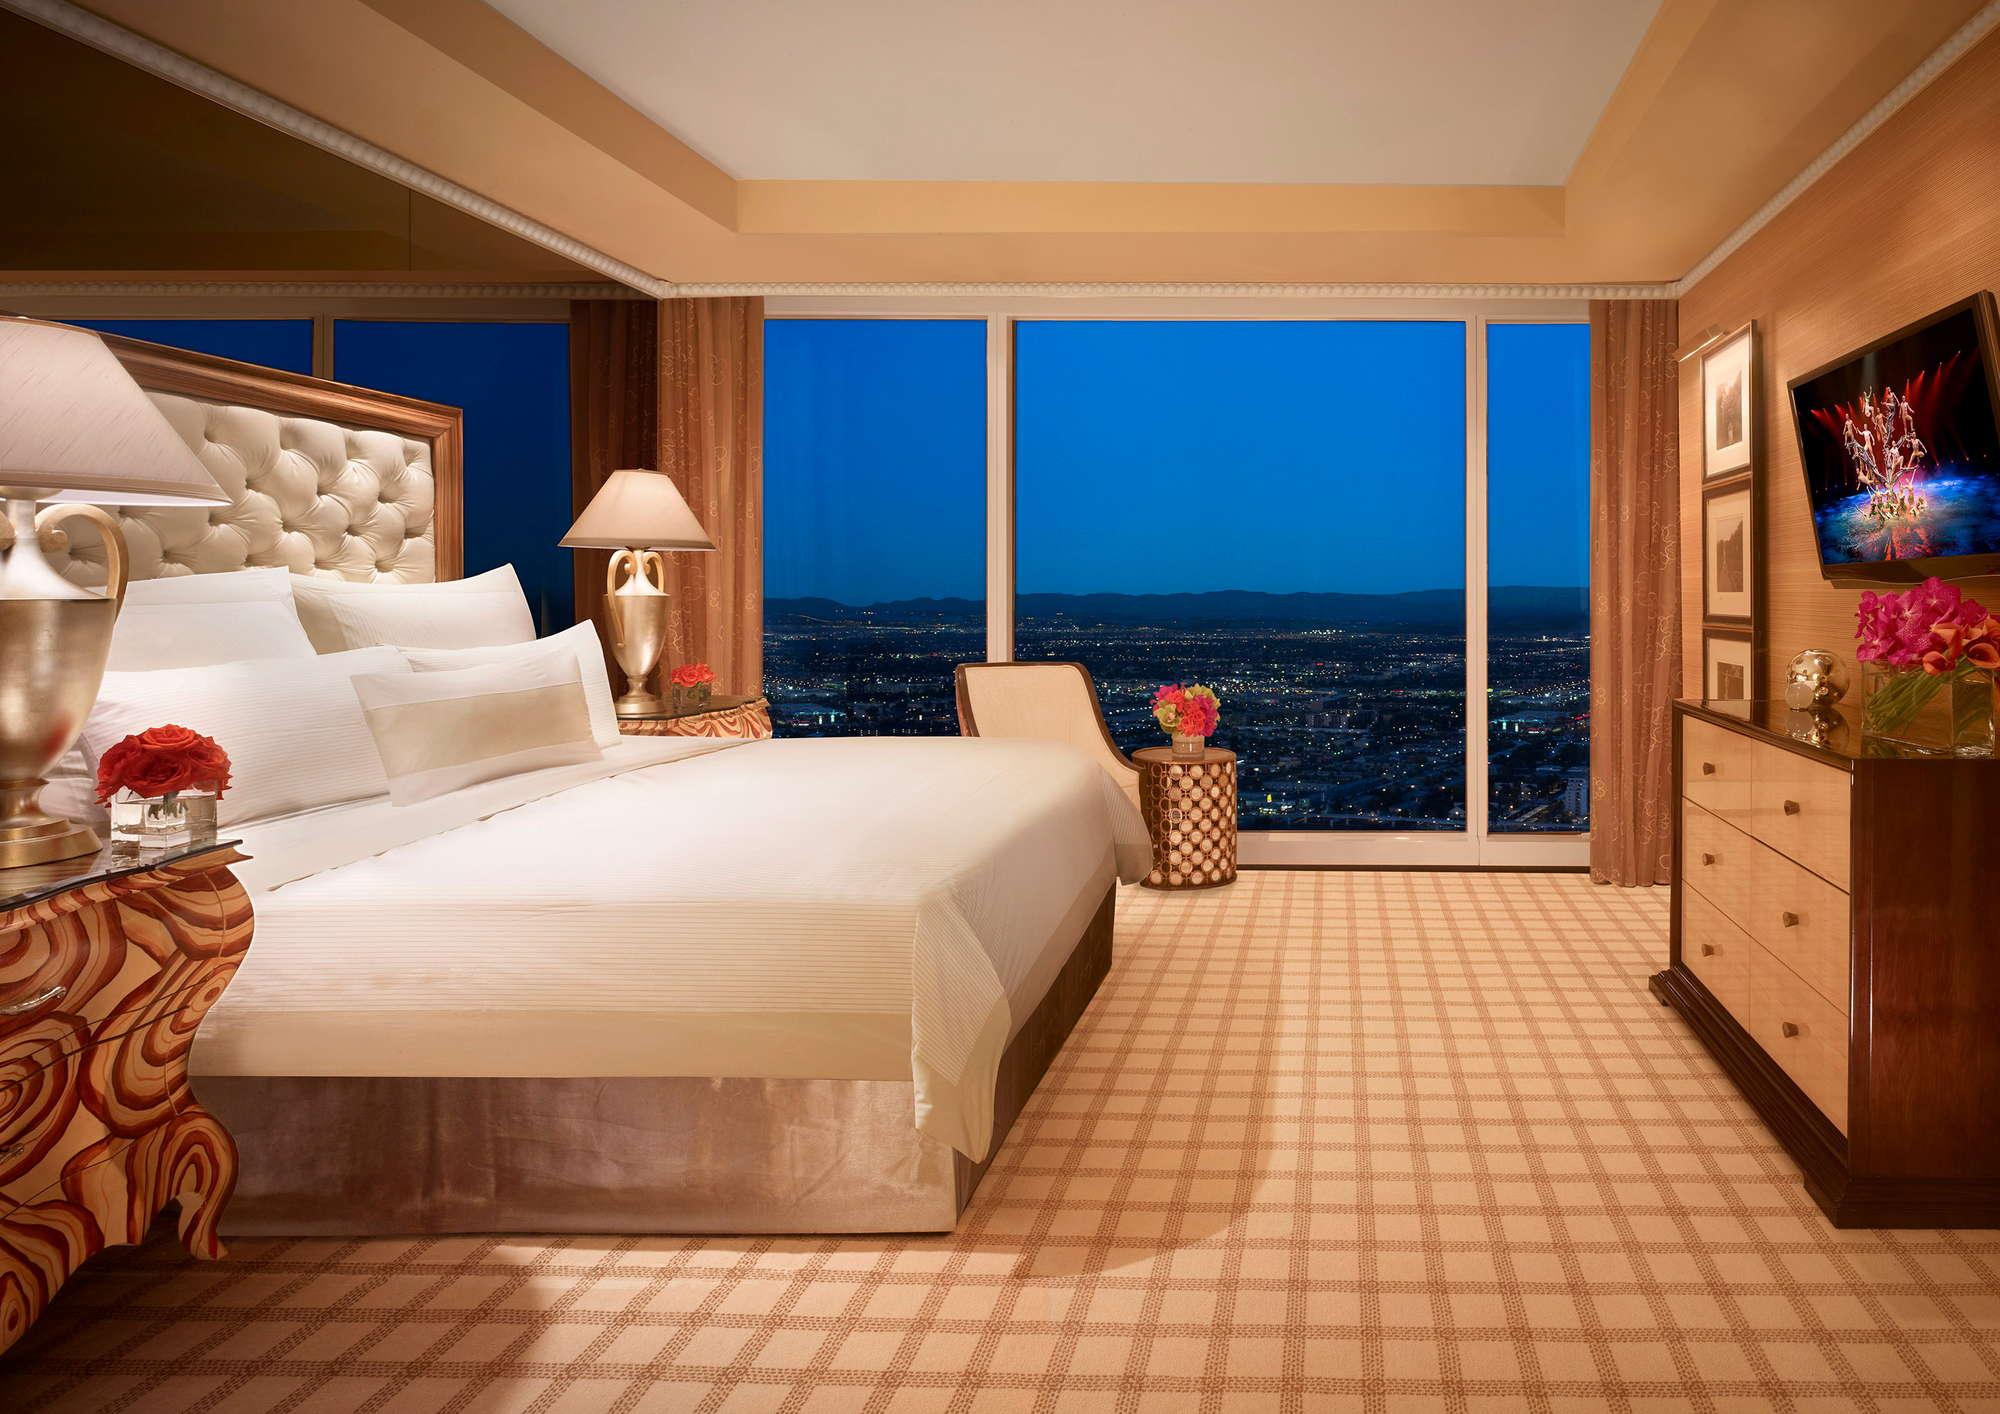 Wynn Las Vegas Expert Review | Fodor's Travel